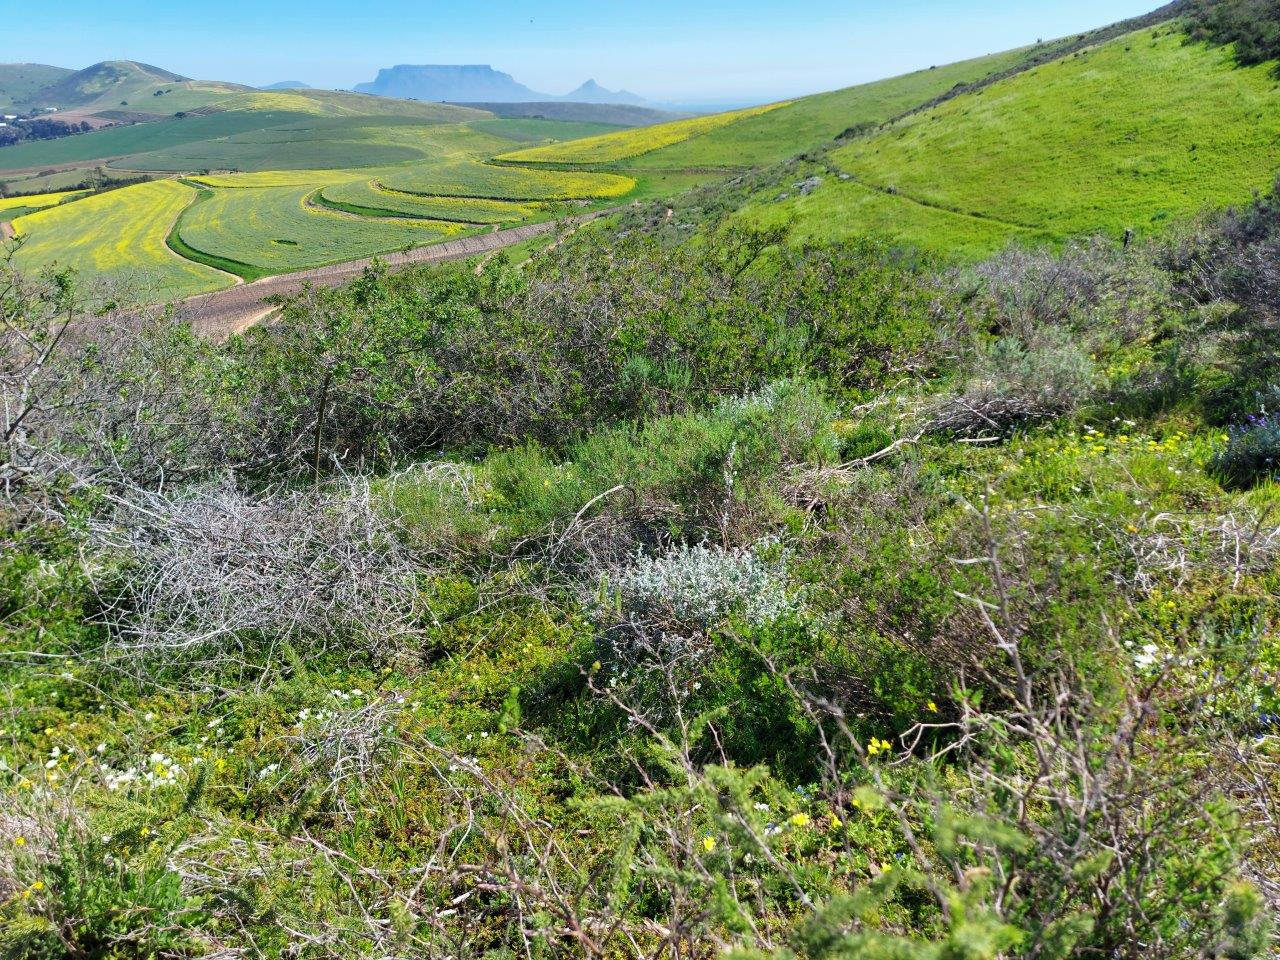 Diemersdal Wine Estate Becomes WWF Conservation Champion for Preserving Endangered Ecosystem photo